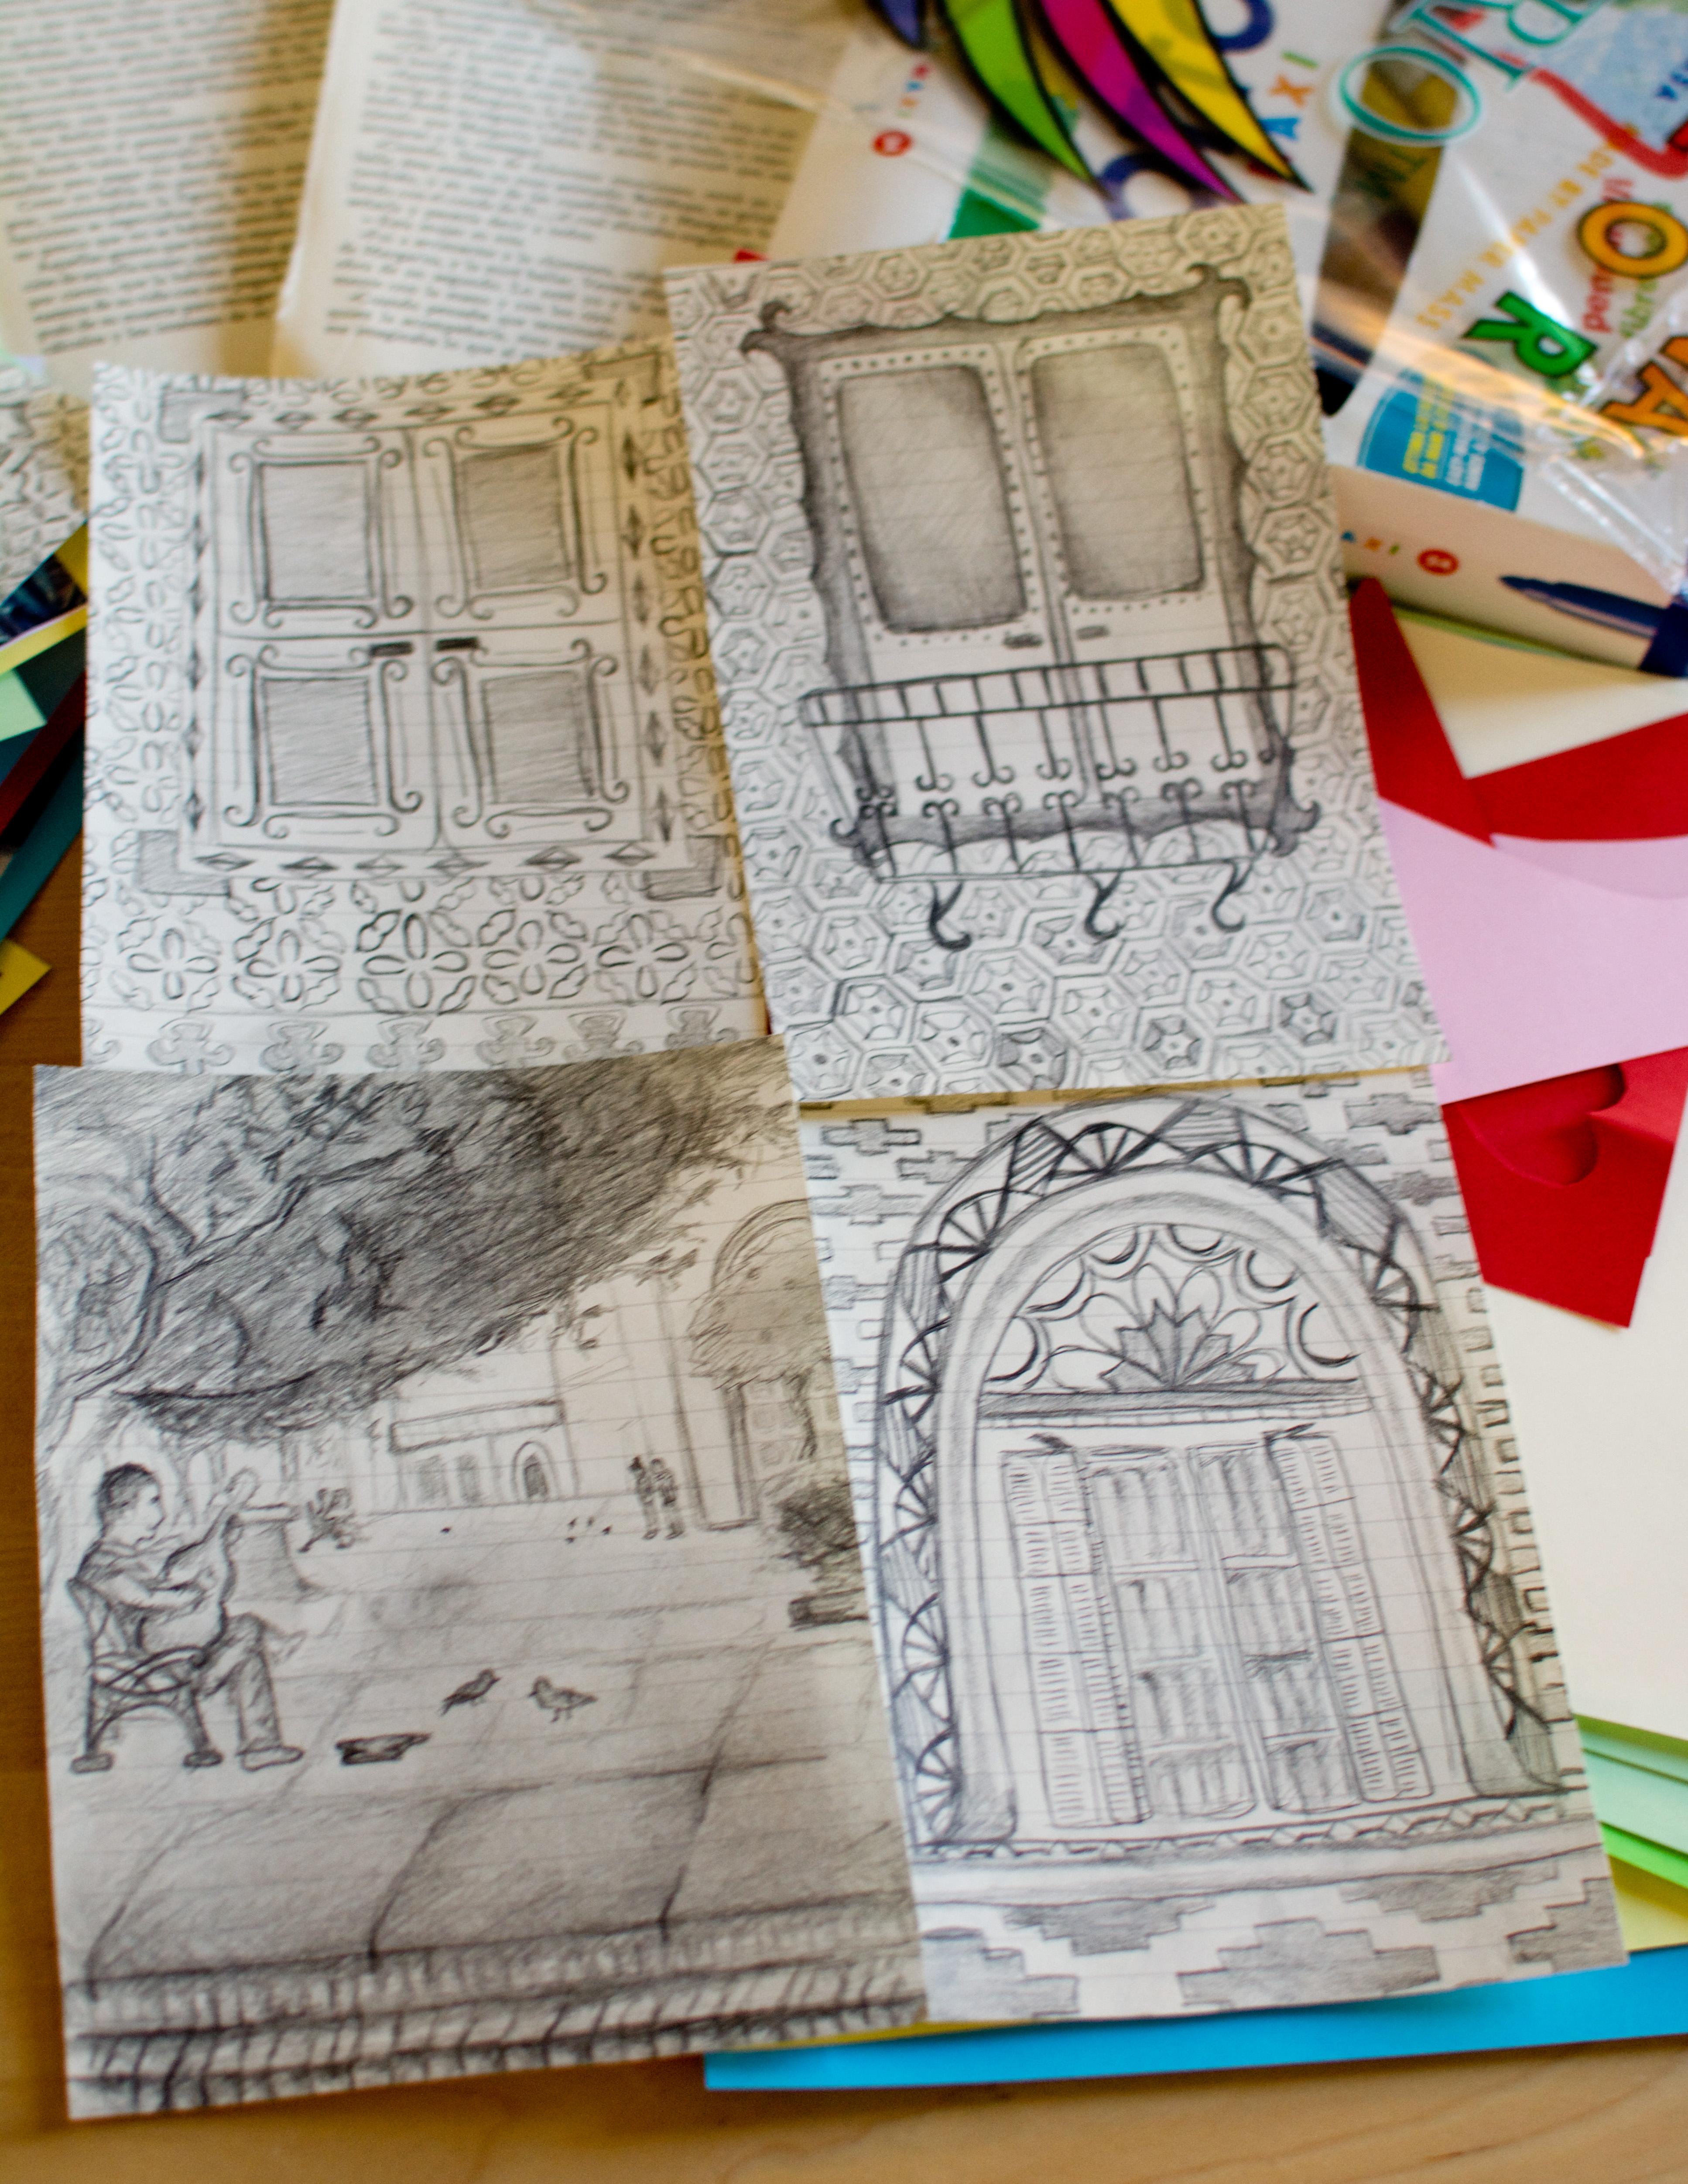 Proctor en Segovia student sketches